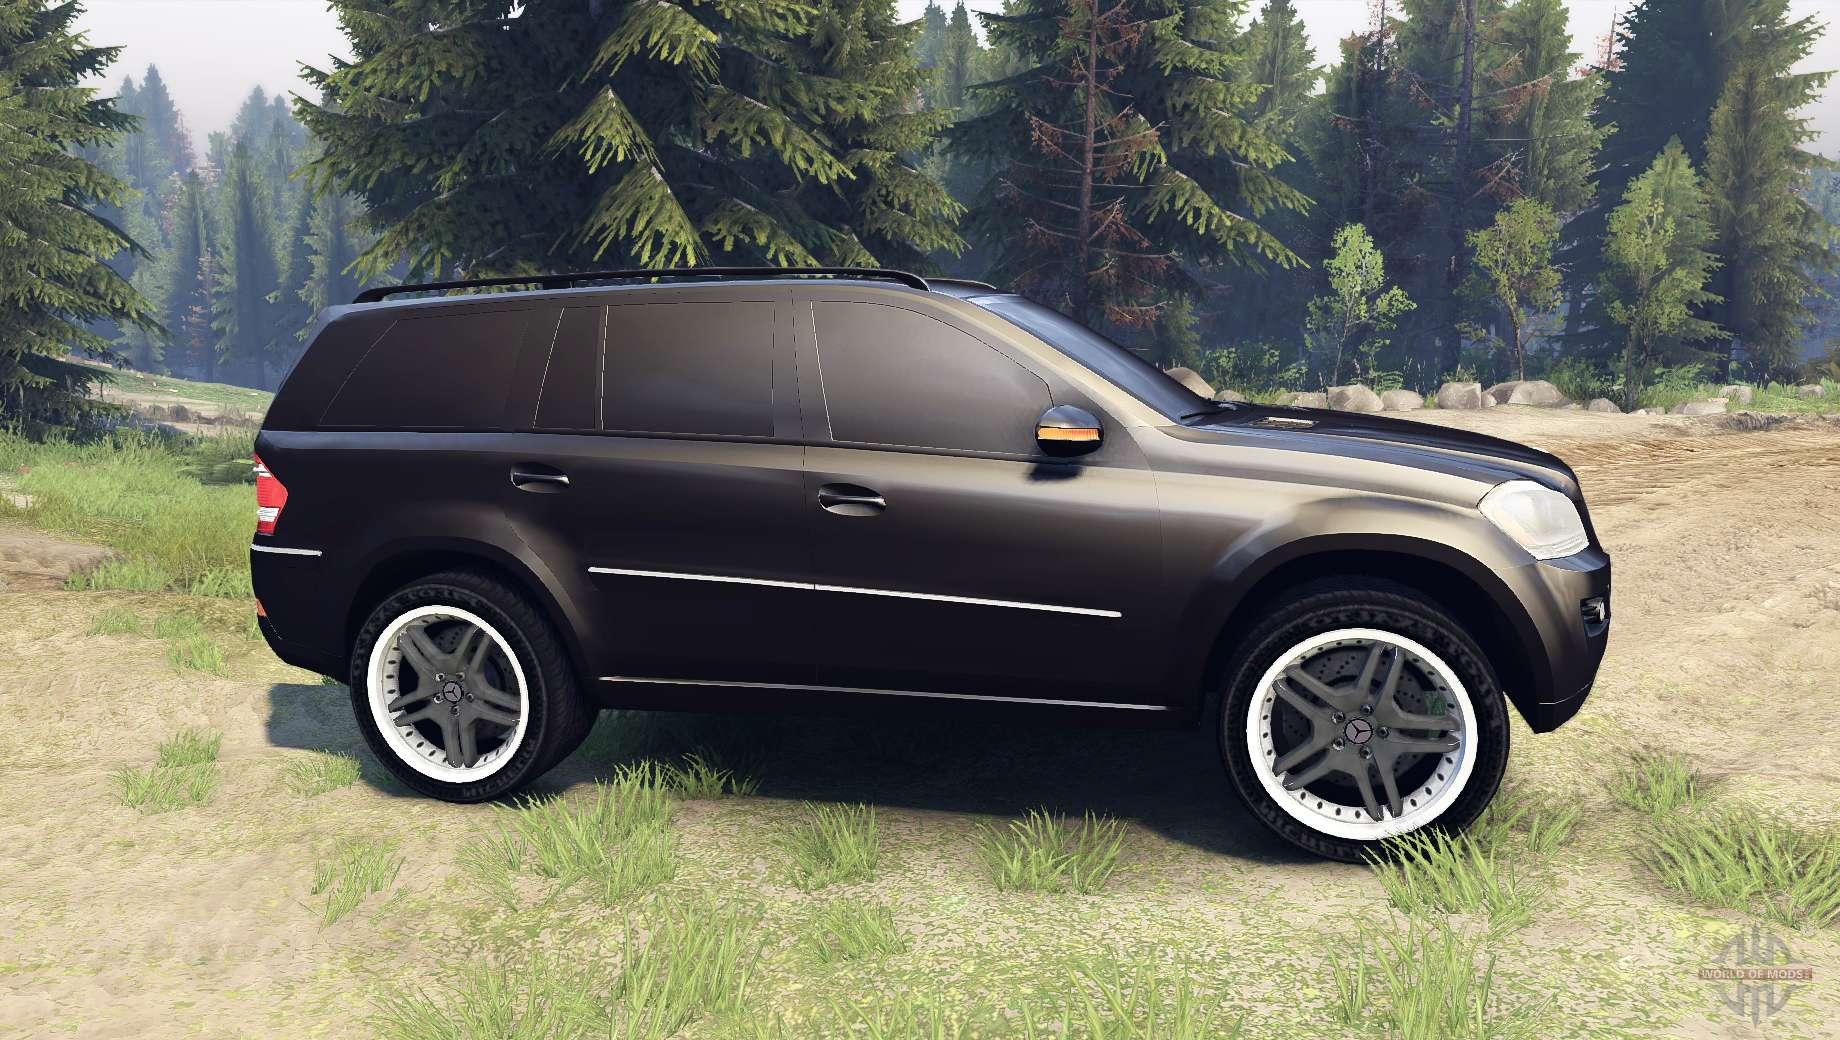 Mercedes benz gl 500 for spin tires for Mercedes benz gl450 tires